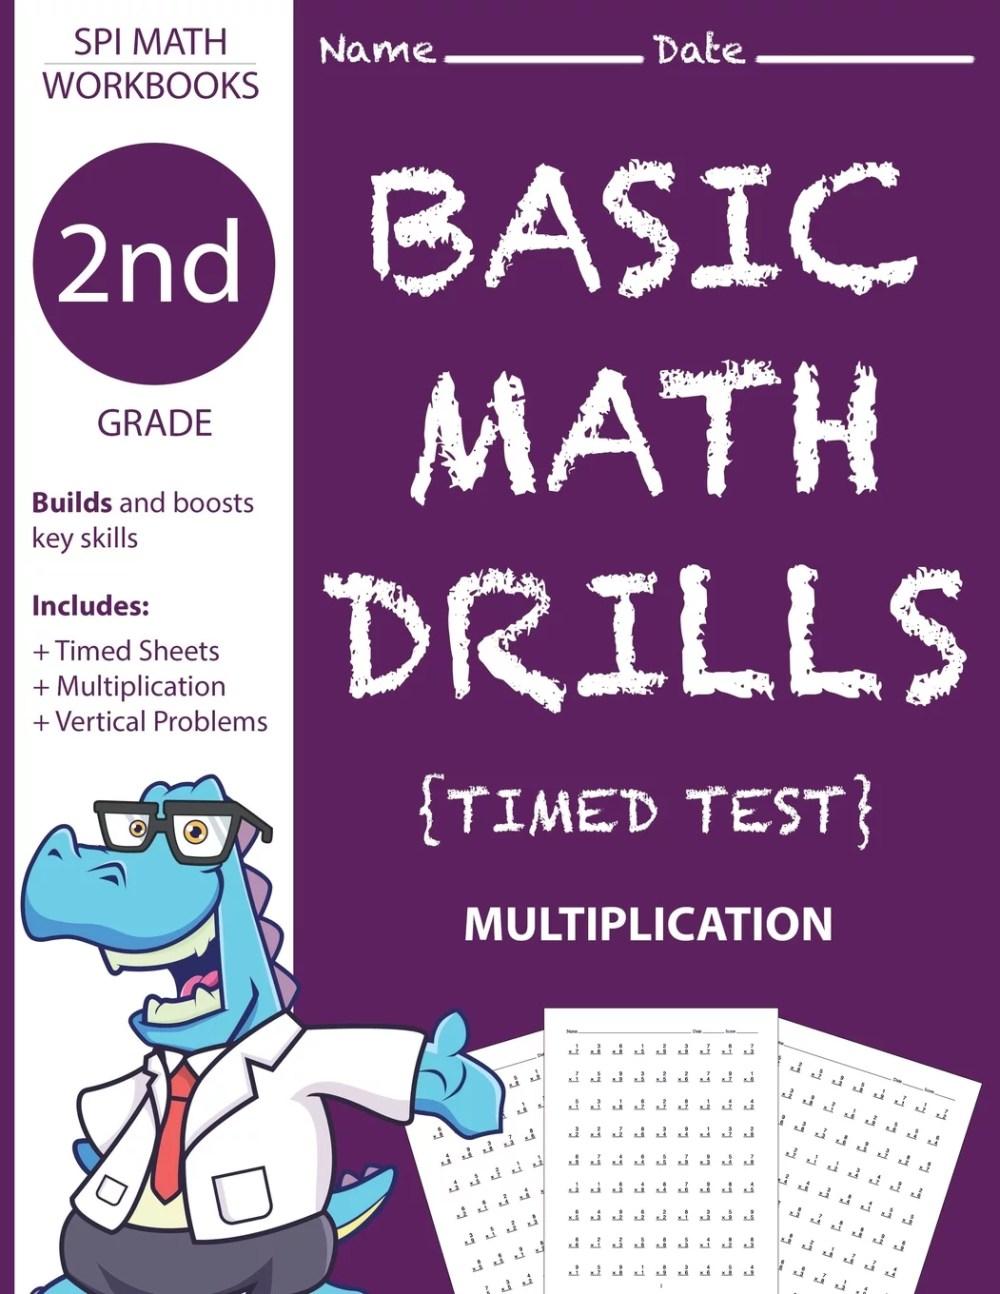 medium resolution of 2nd Grade Basic Math Drills Timed Test : Builds and Boosts Key Skills  Including Math Drills and Vertical Multiplication Problem Worksheets . (SPI  Math Workbooks) (Volume 4) - Walmart.com - Walmart.com